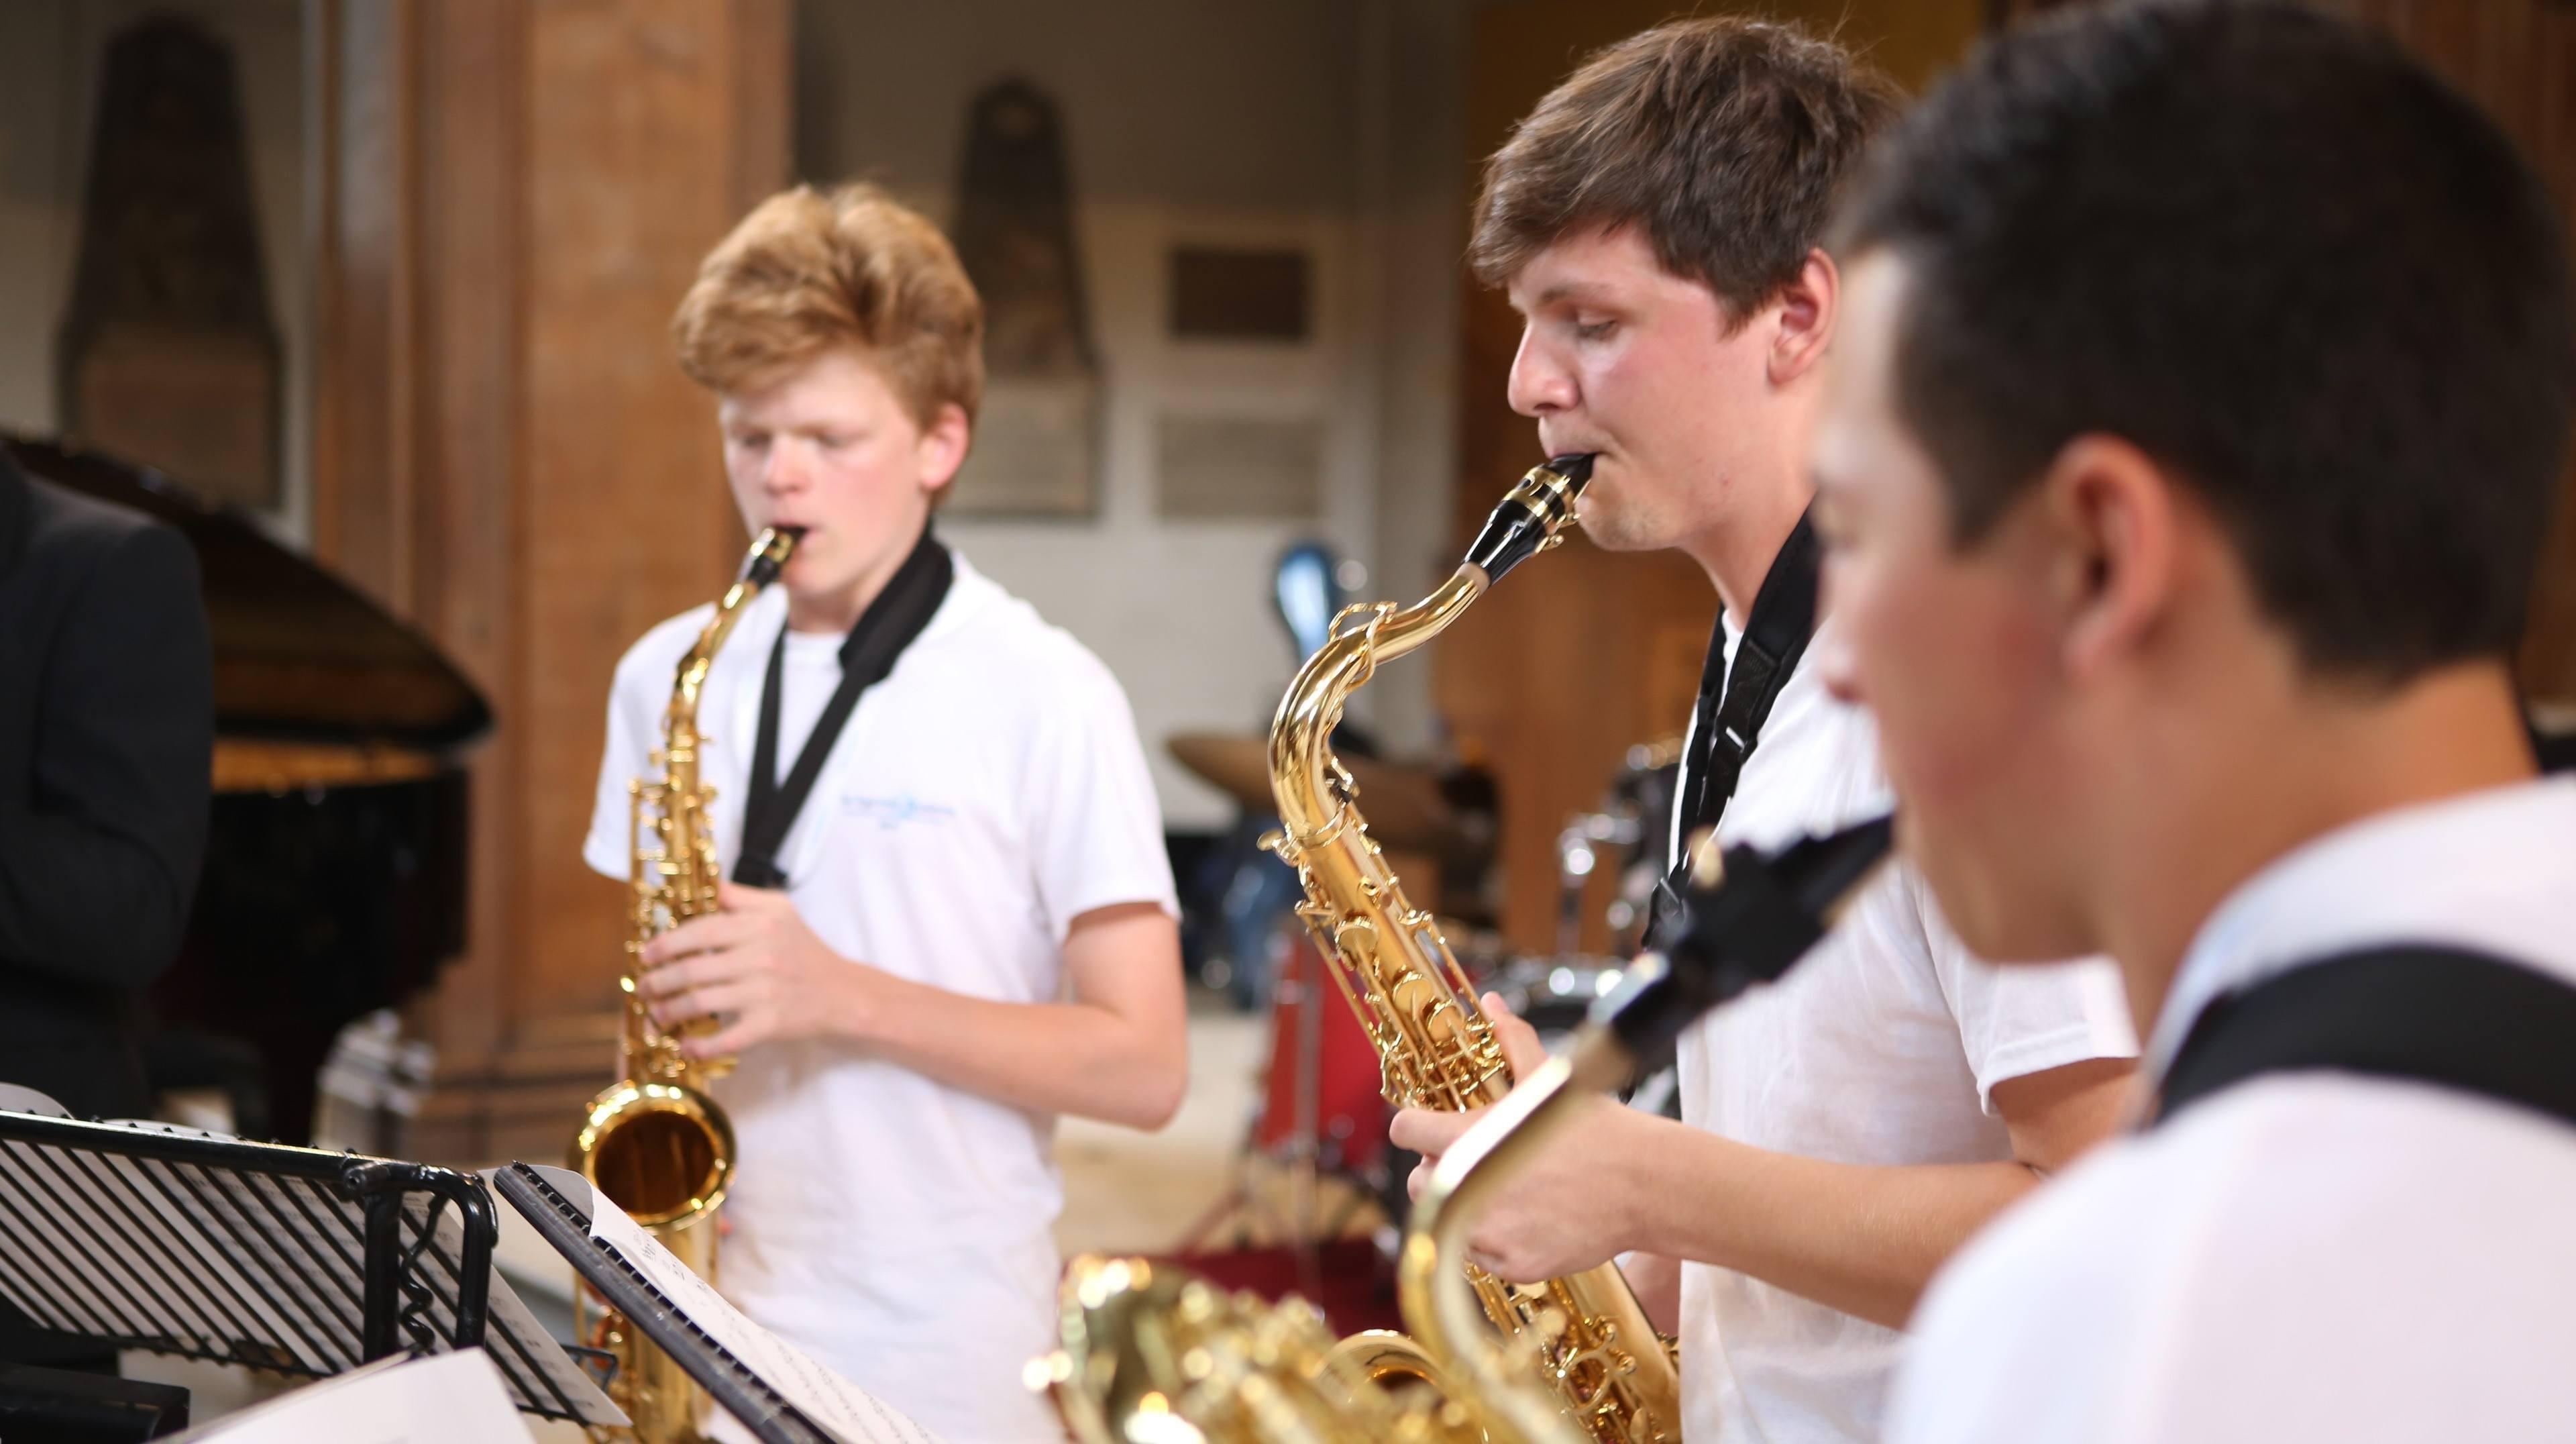 The Ingenium Academy Saxophone Quartet at St James's Piccadilly